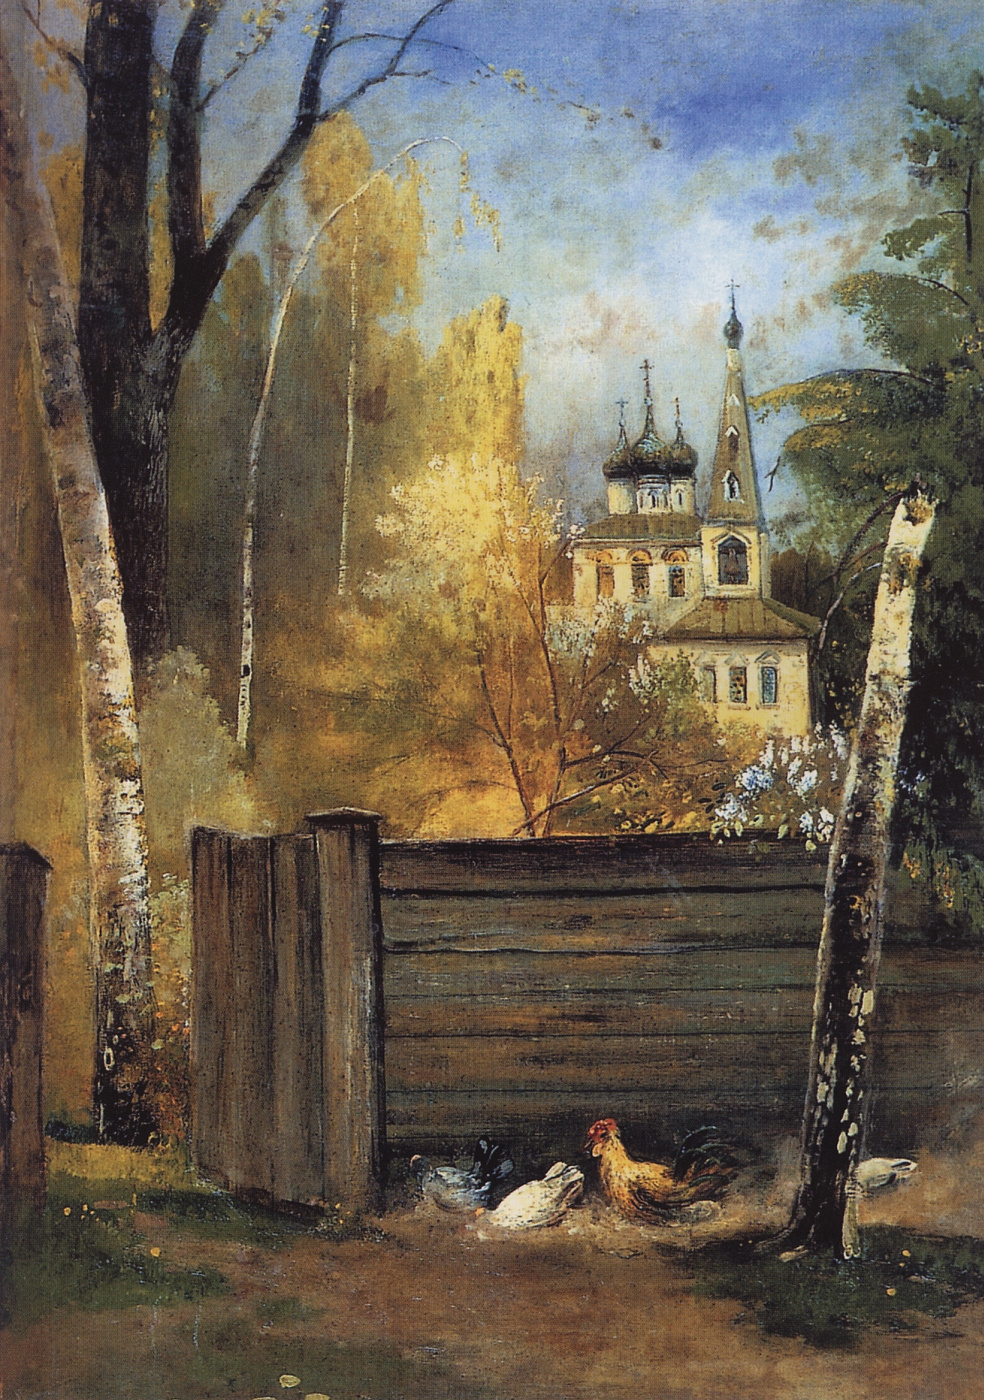 Alexey Savrasov. Spring. Provincial courtyard